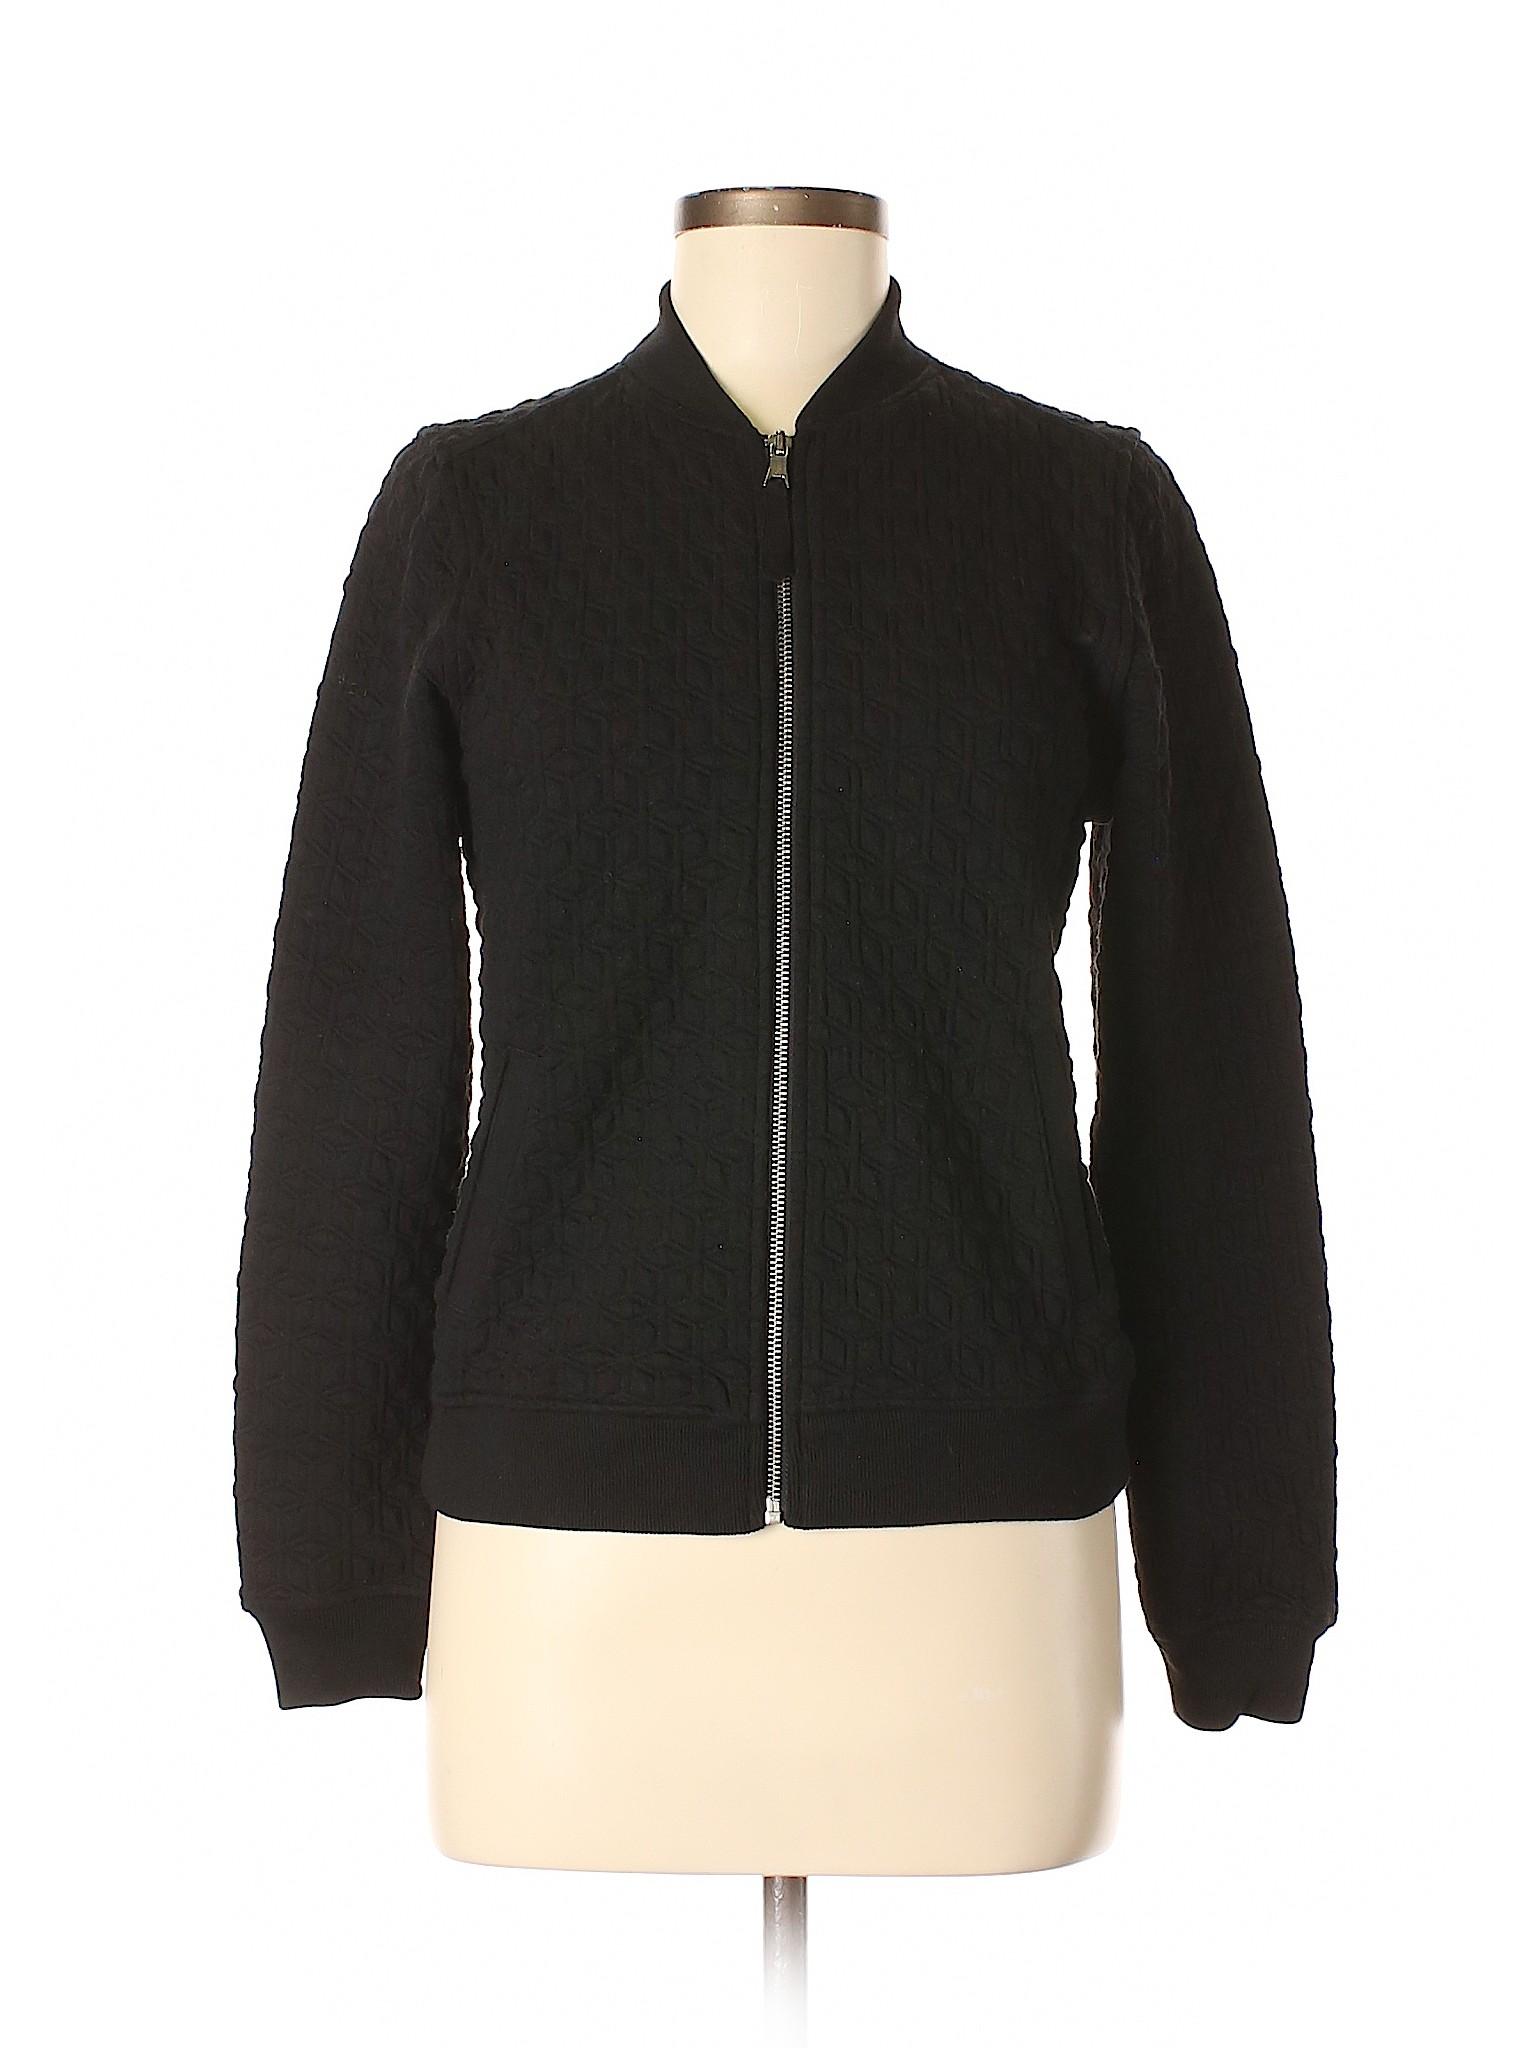 winter Boutique winter Gap Boutique Jacket qfa1E